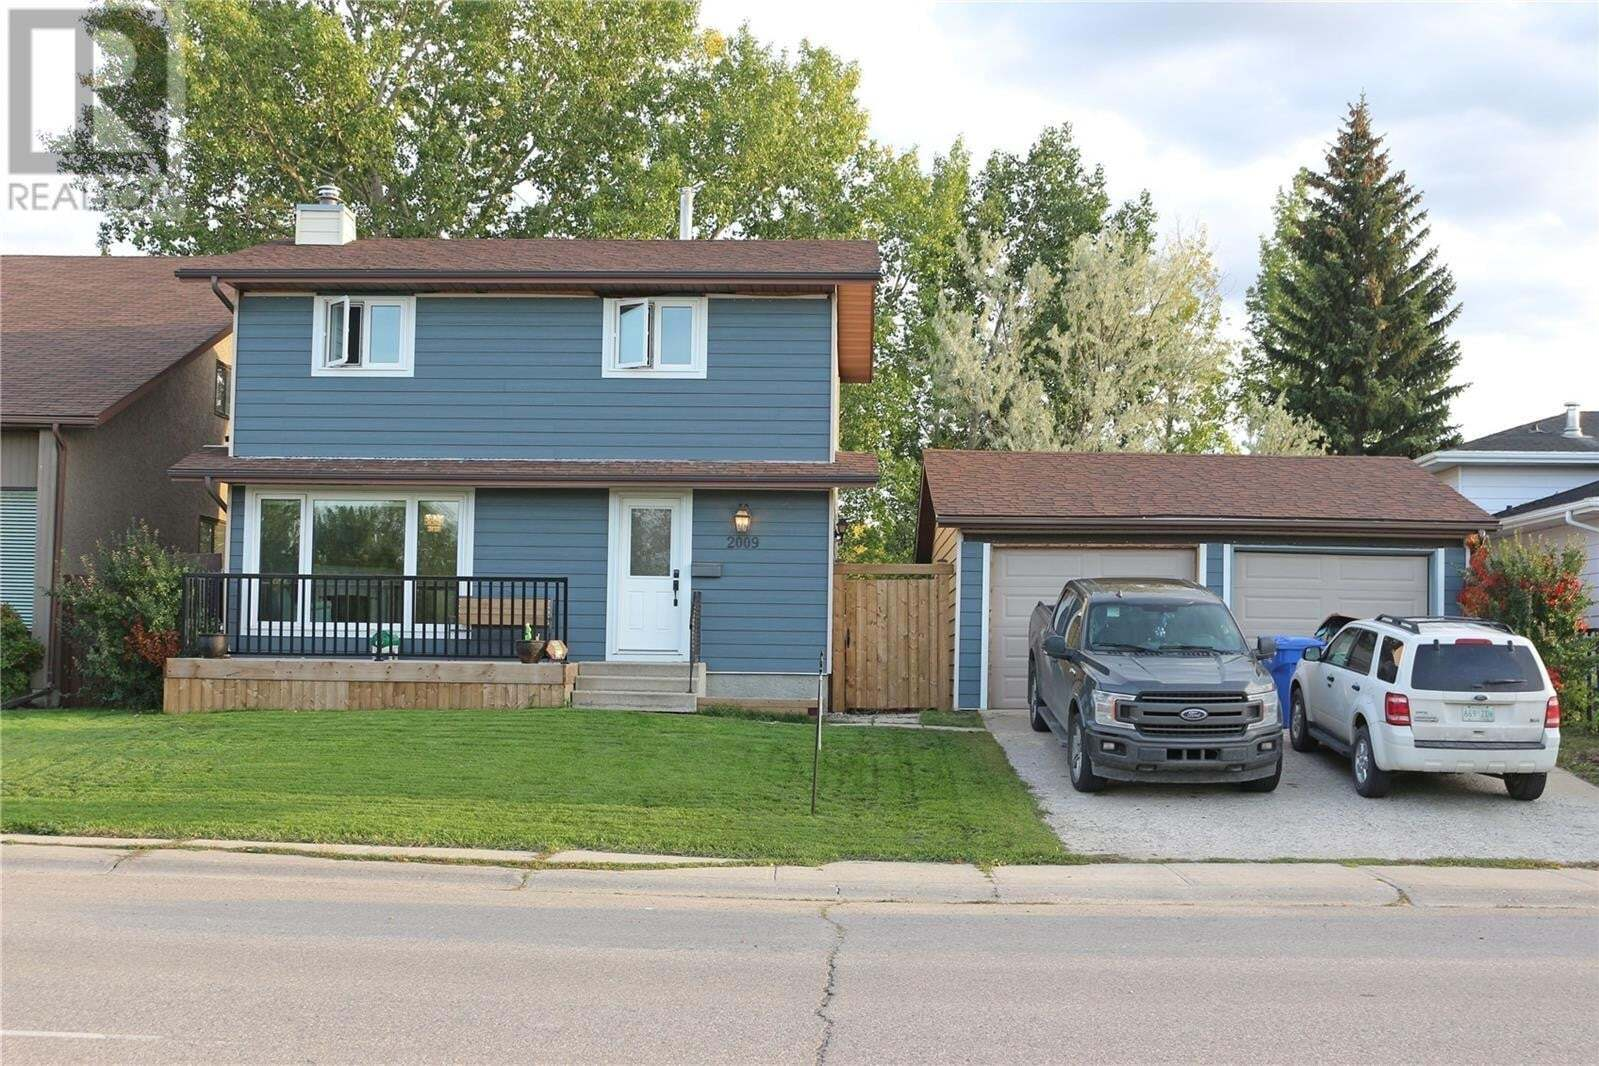 House for sale at 2009 12th Ave Regina Saskatchewan - MLS: SK810457